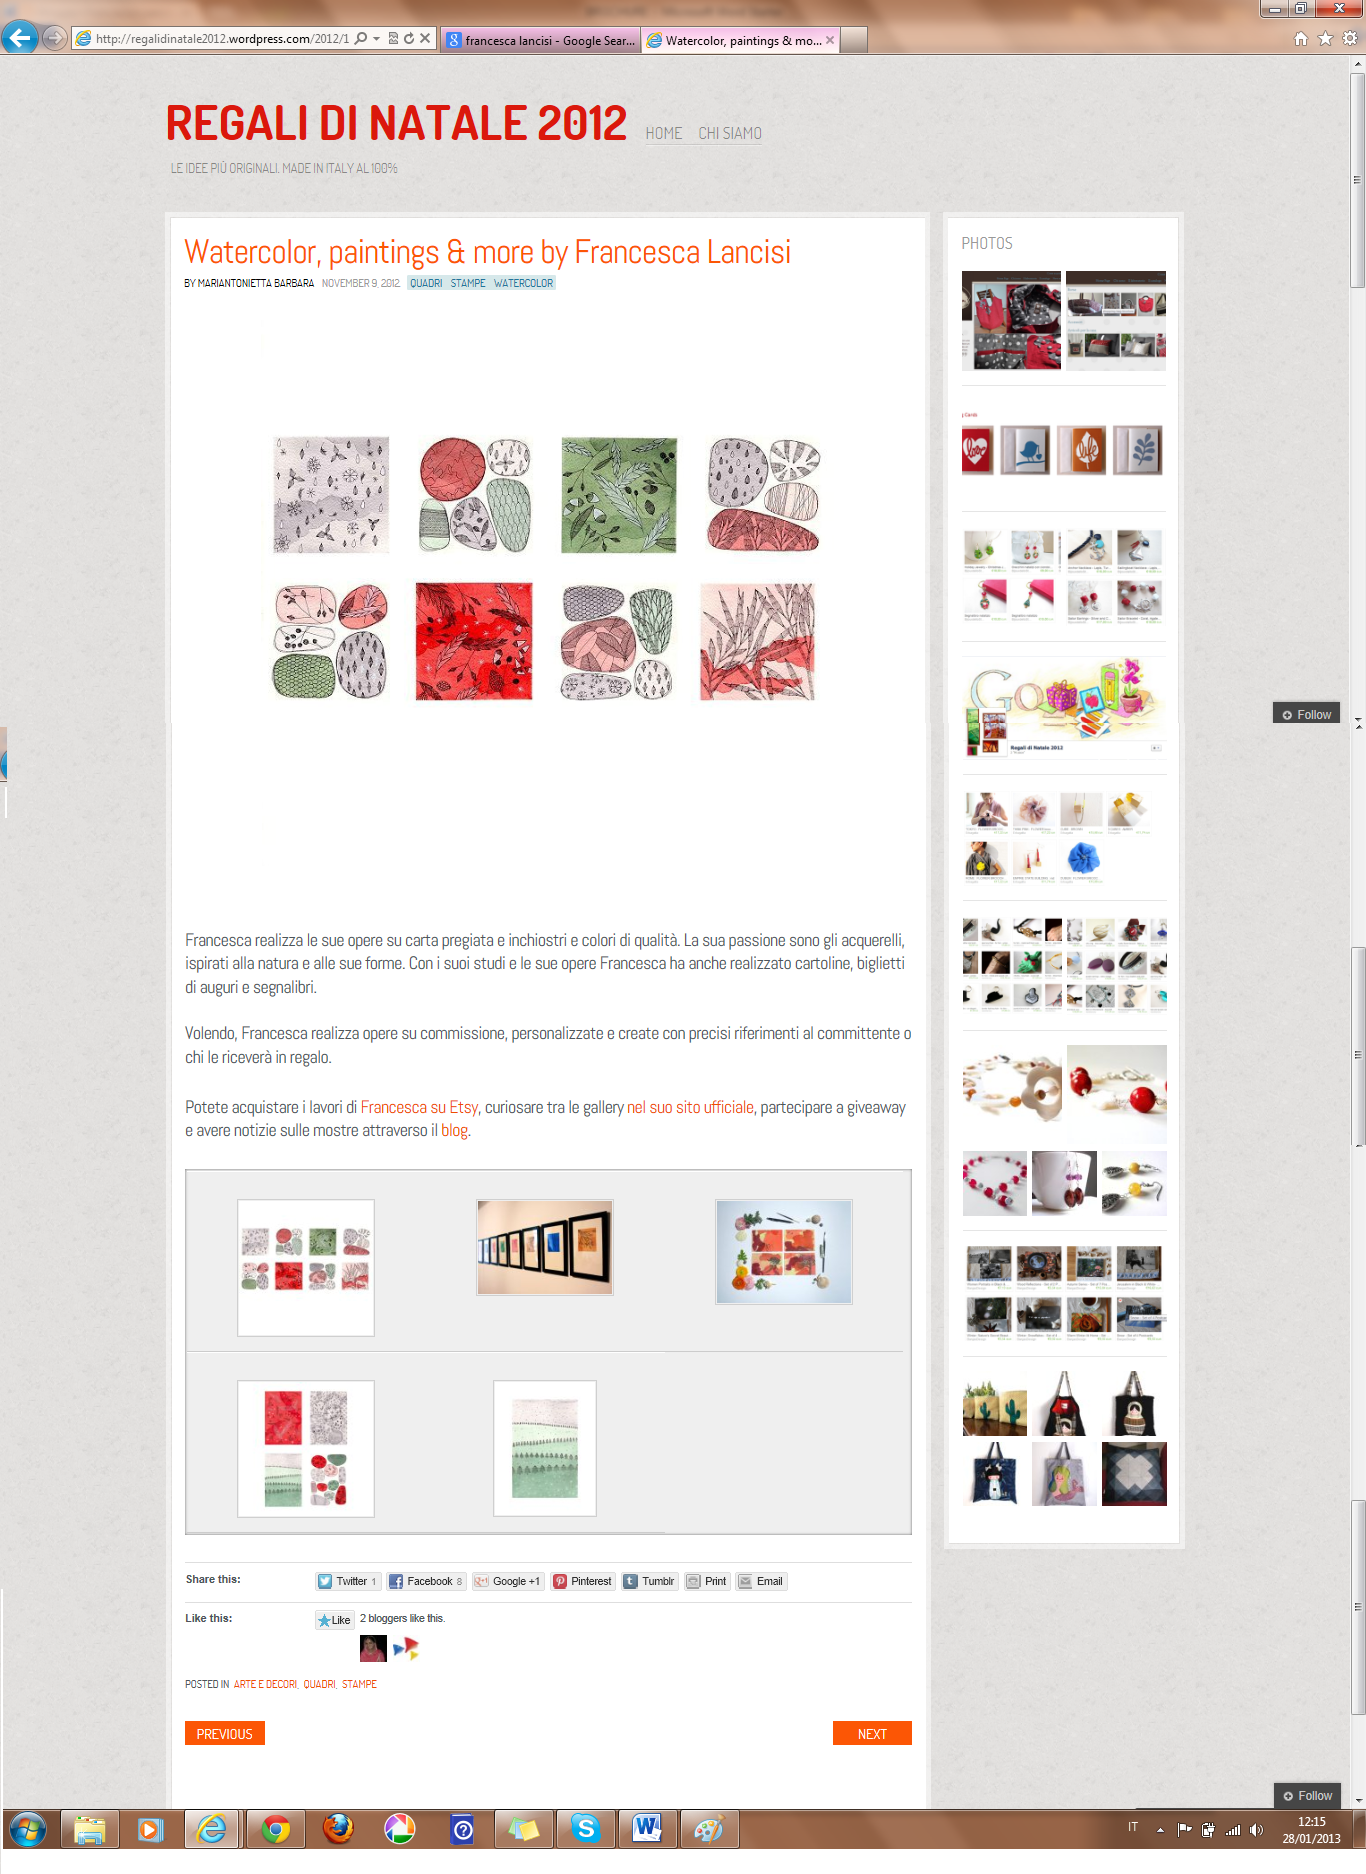 REGALI DI NATALE 2012 Directory per artigiane made in Italy.png